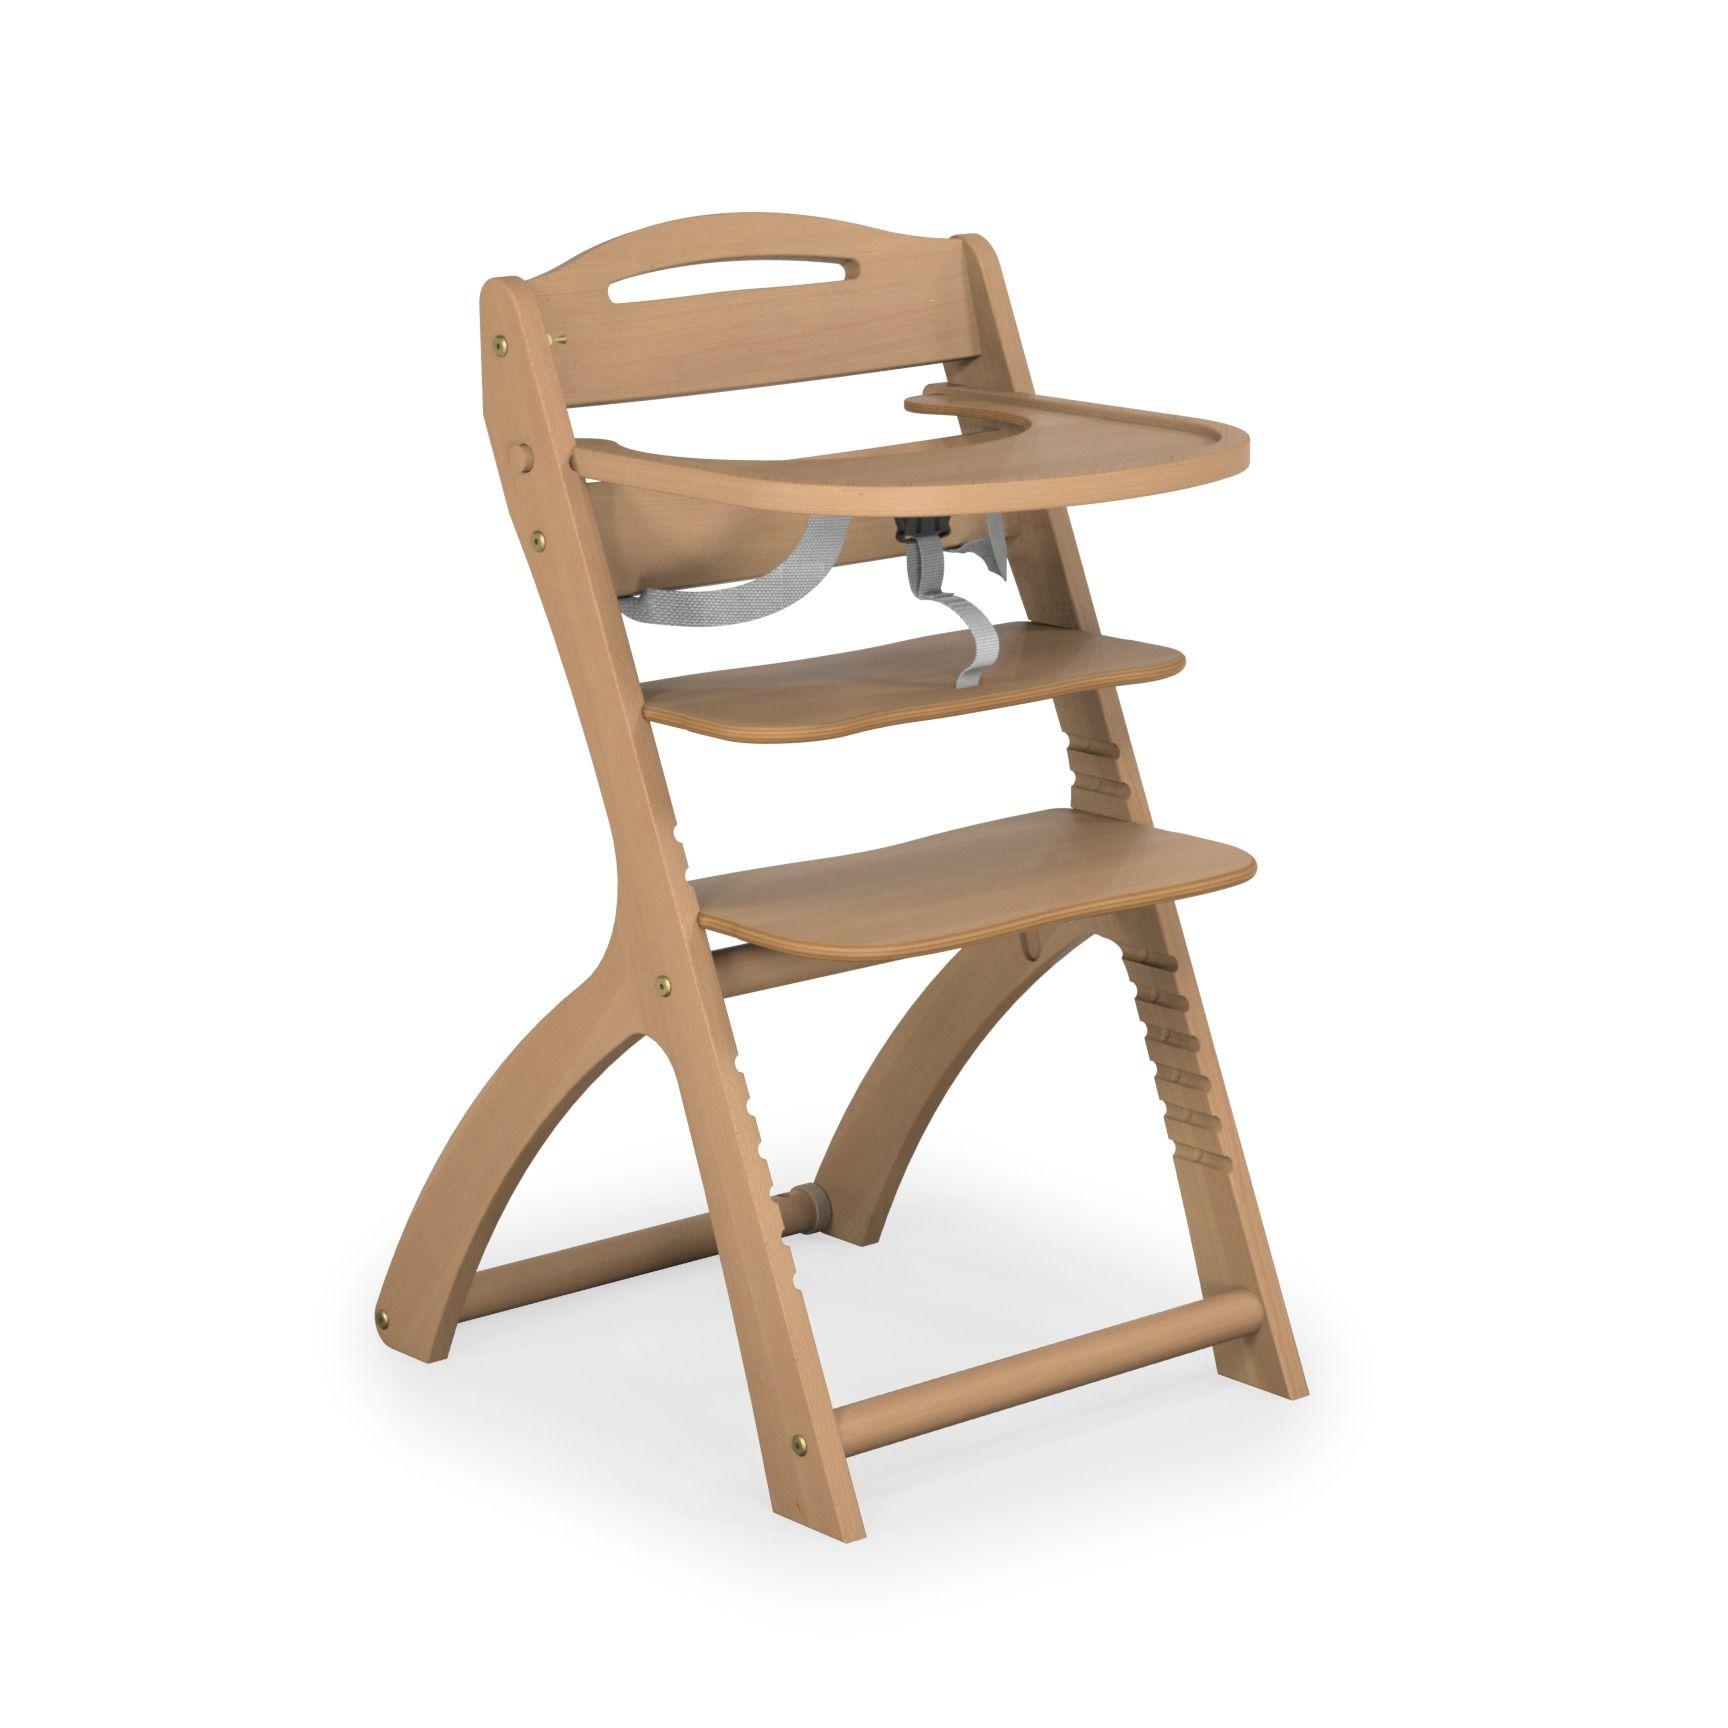 Chaise haute transformable bois vernis